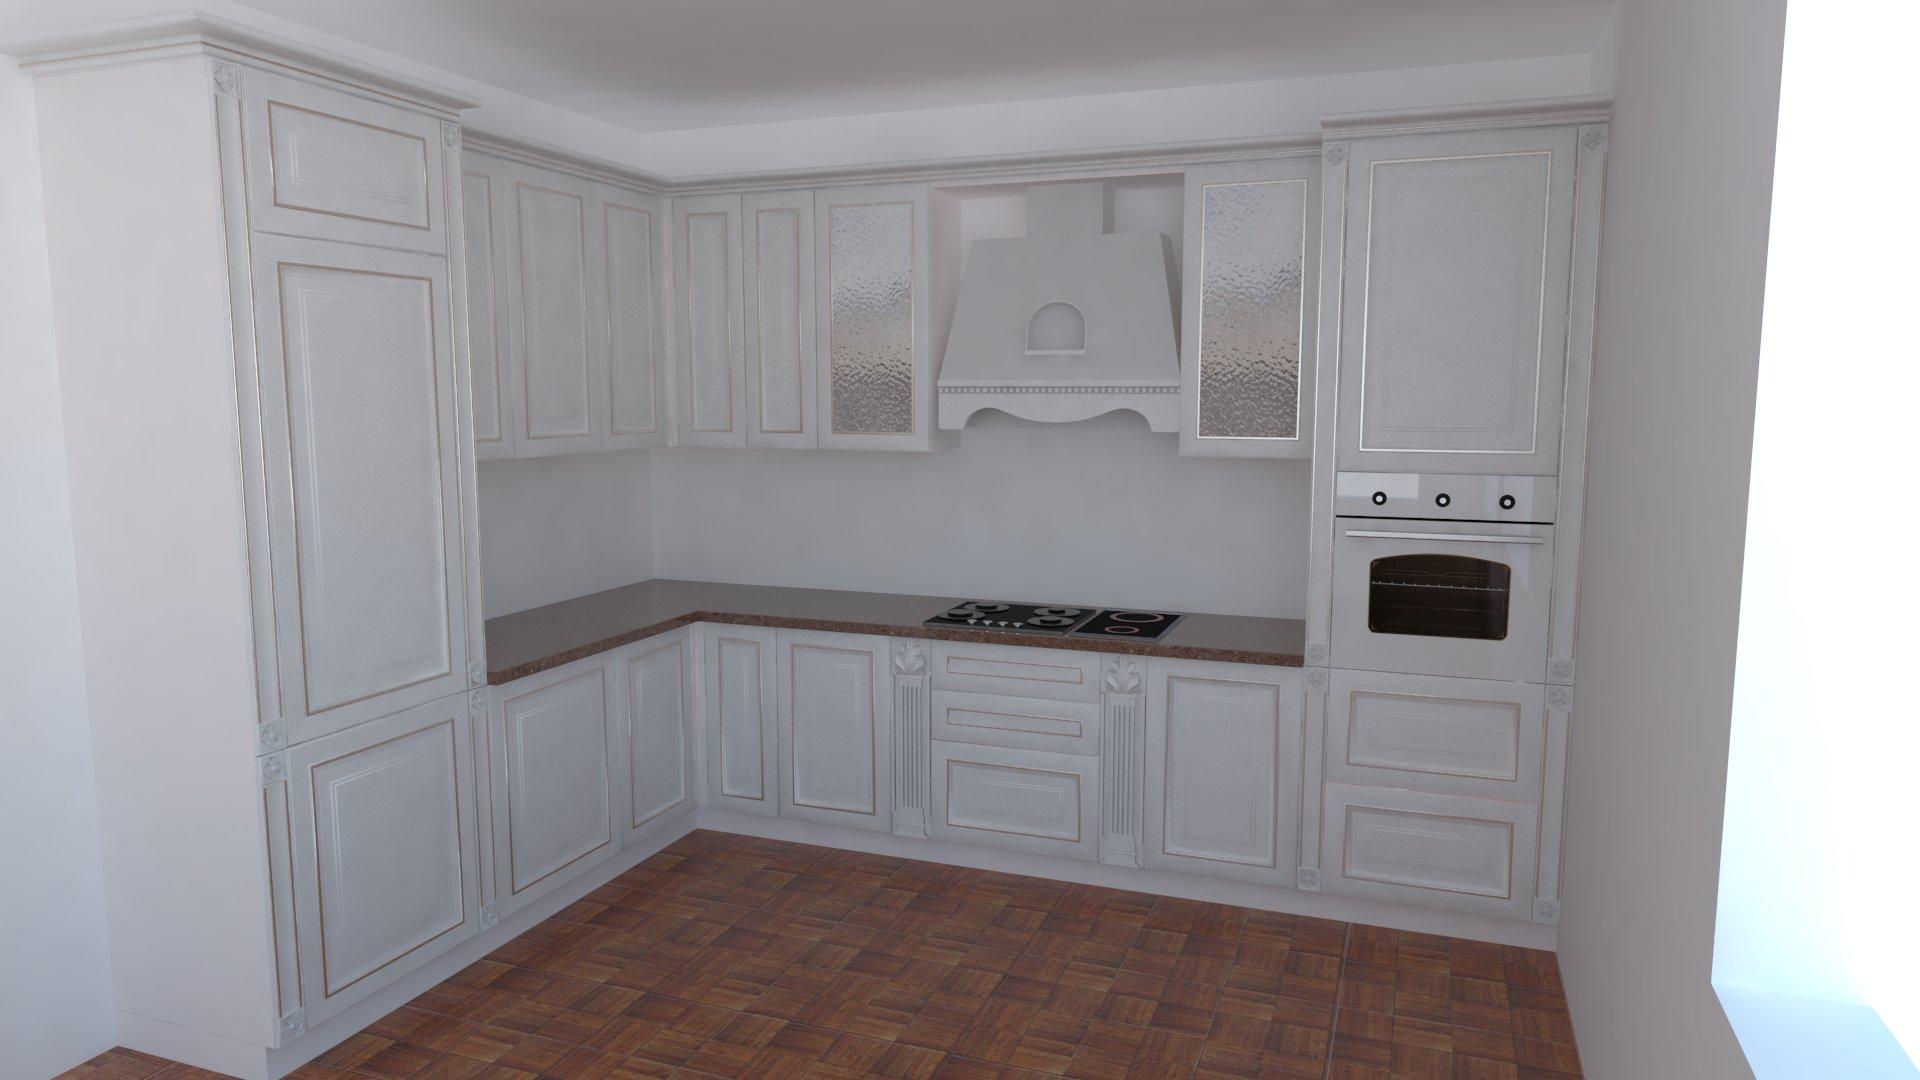 Итальянский_фасад_кухня